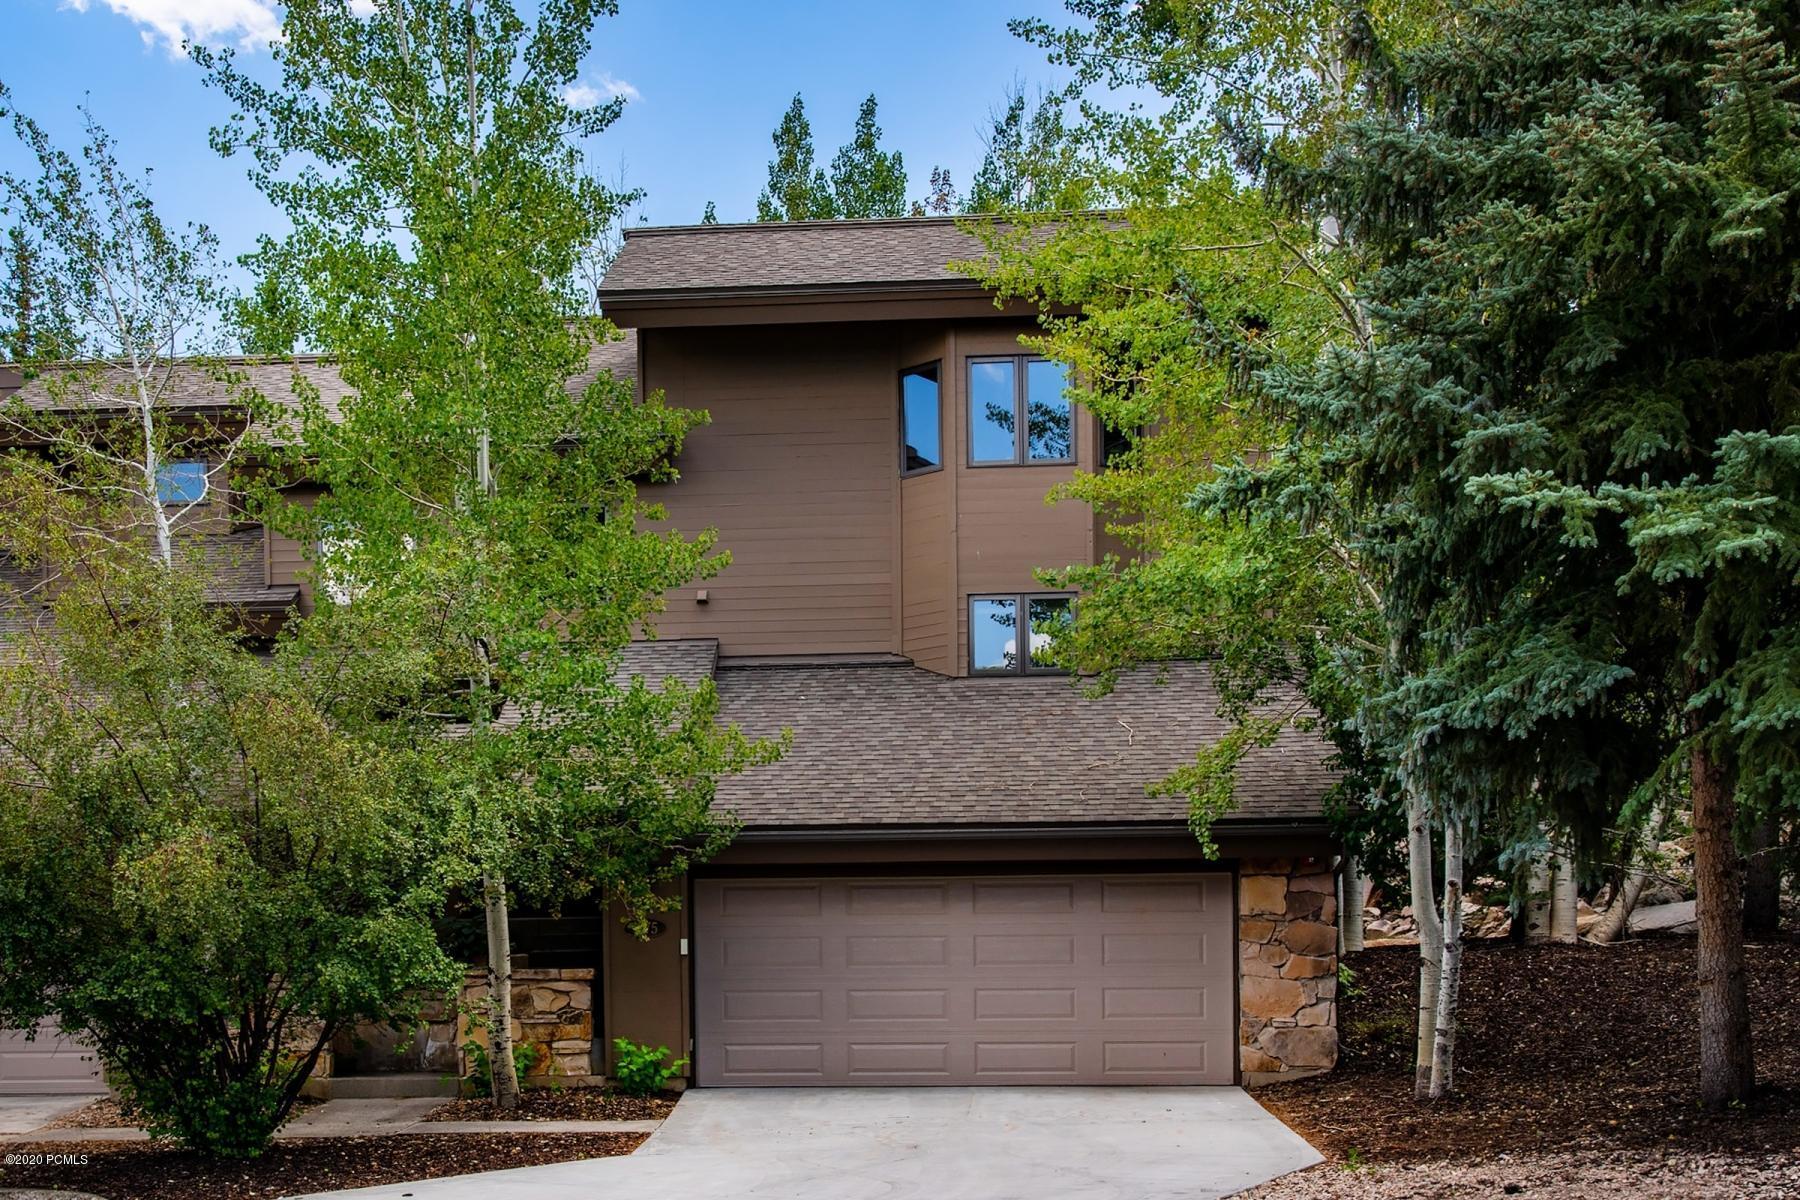 1775 Lakeside Circle, Park City, Utah 84060, 3 Bedrooms Bedrooms, ,3 BathroomsBathrooms,Condominium,For Sale,Lakeside,12003007